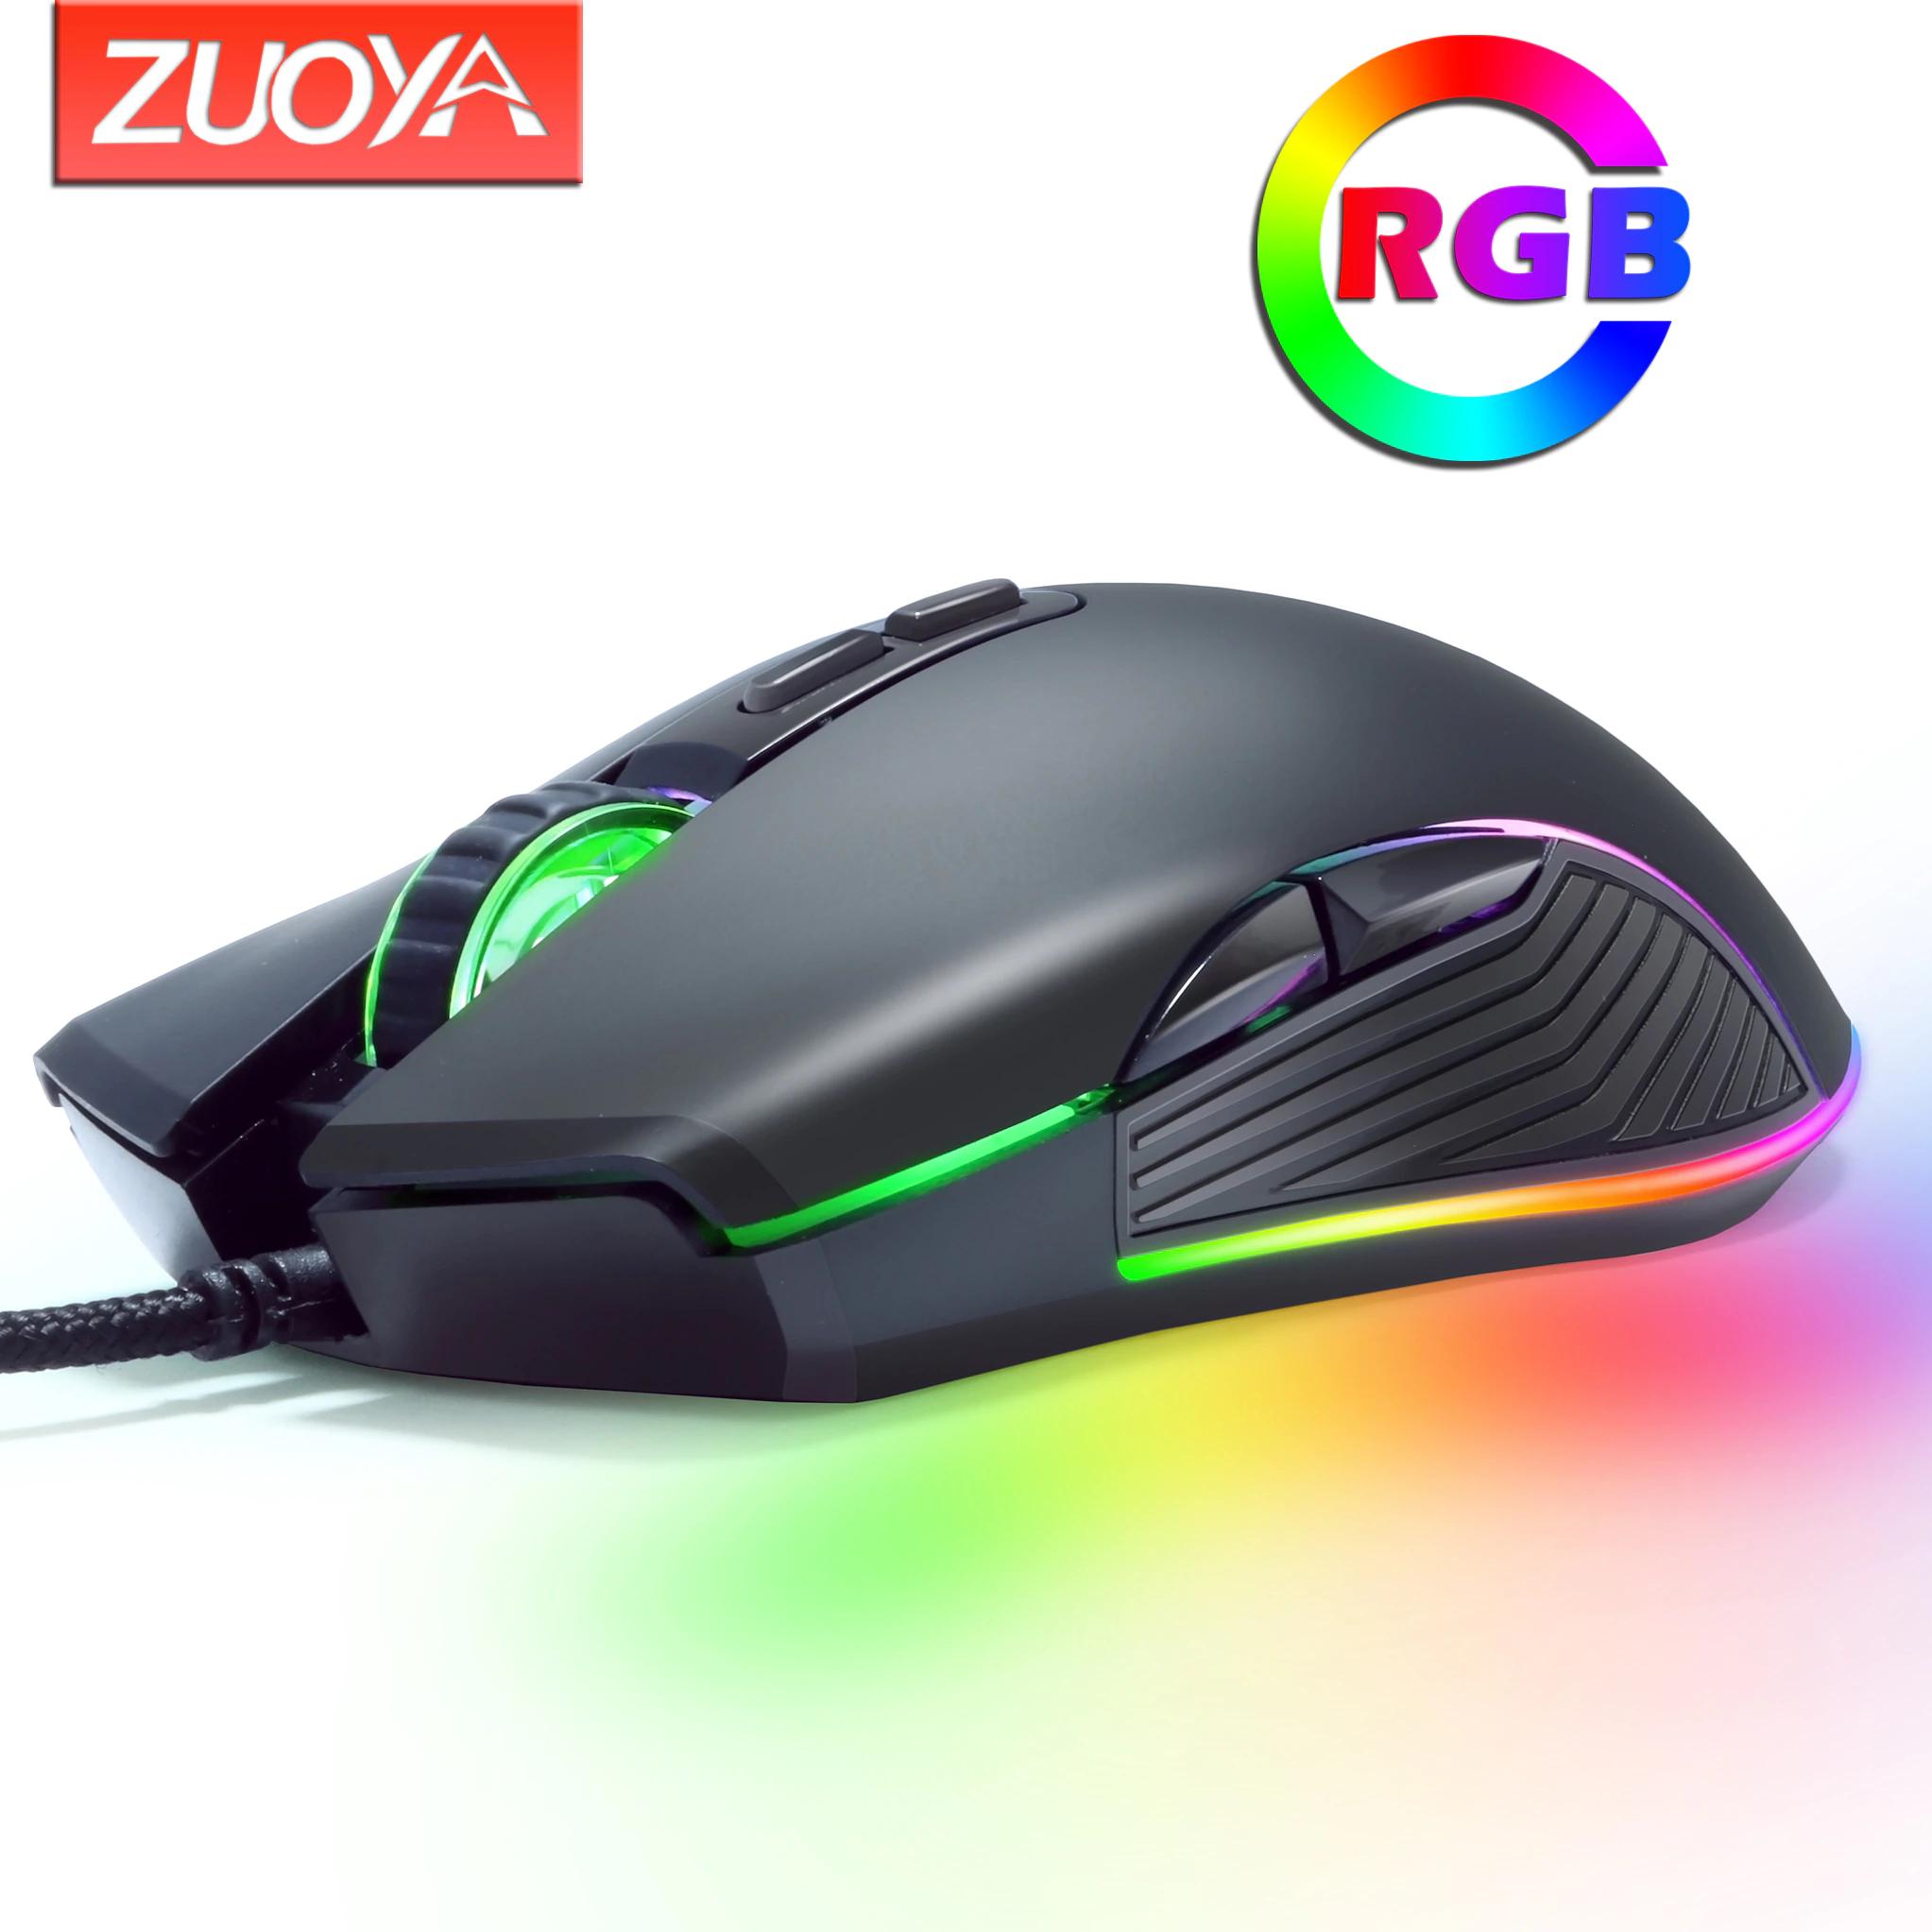 Ratón óptico RGB AT560 3600 DPI